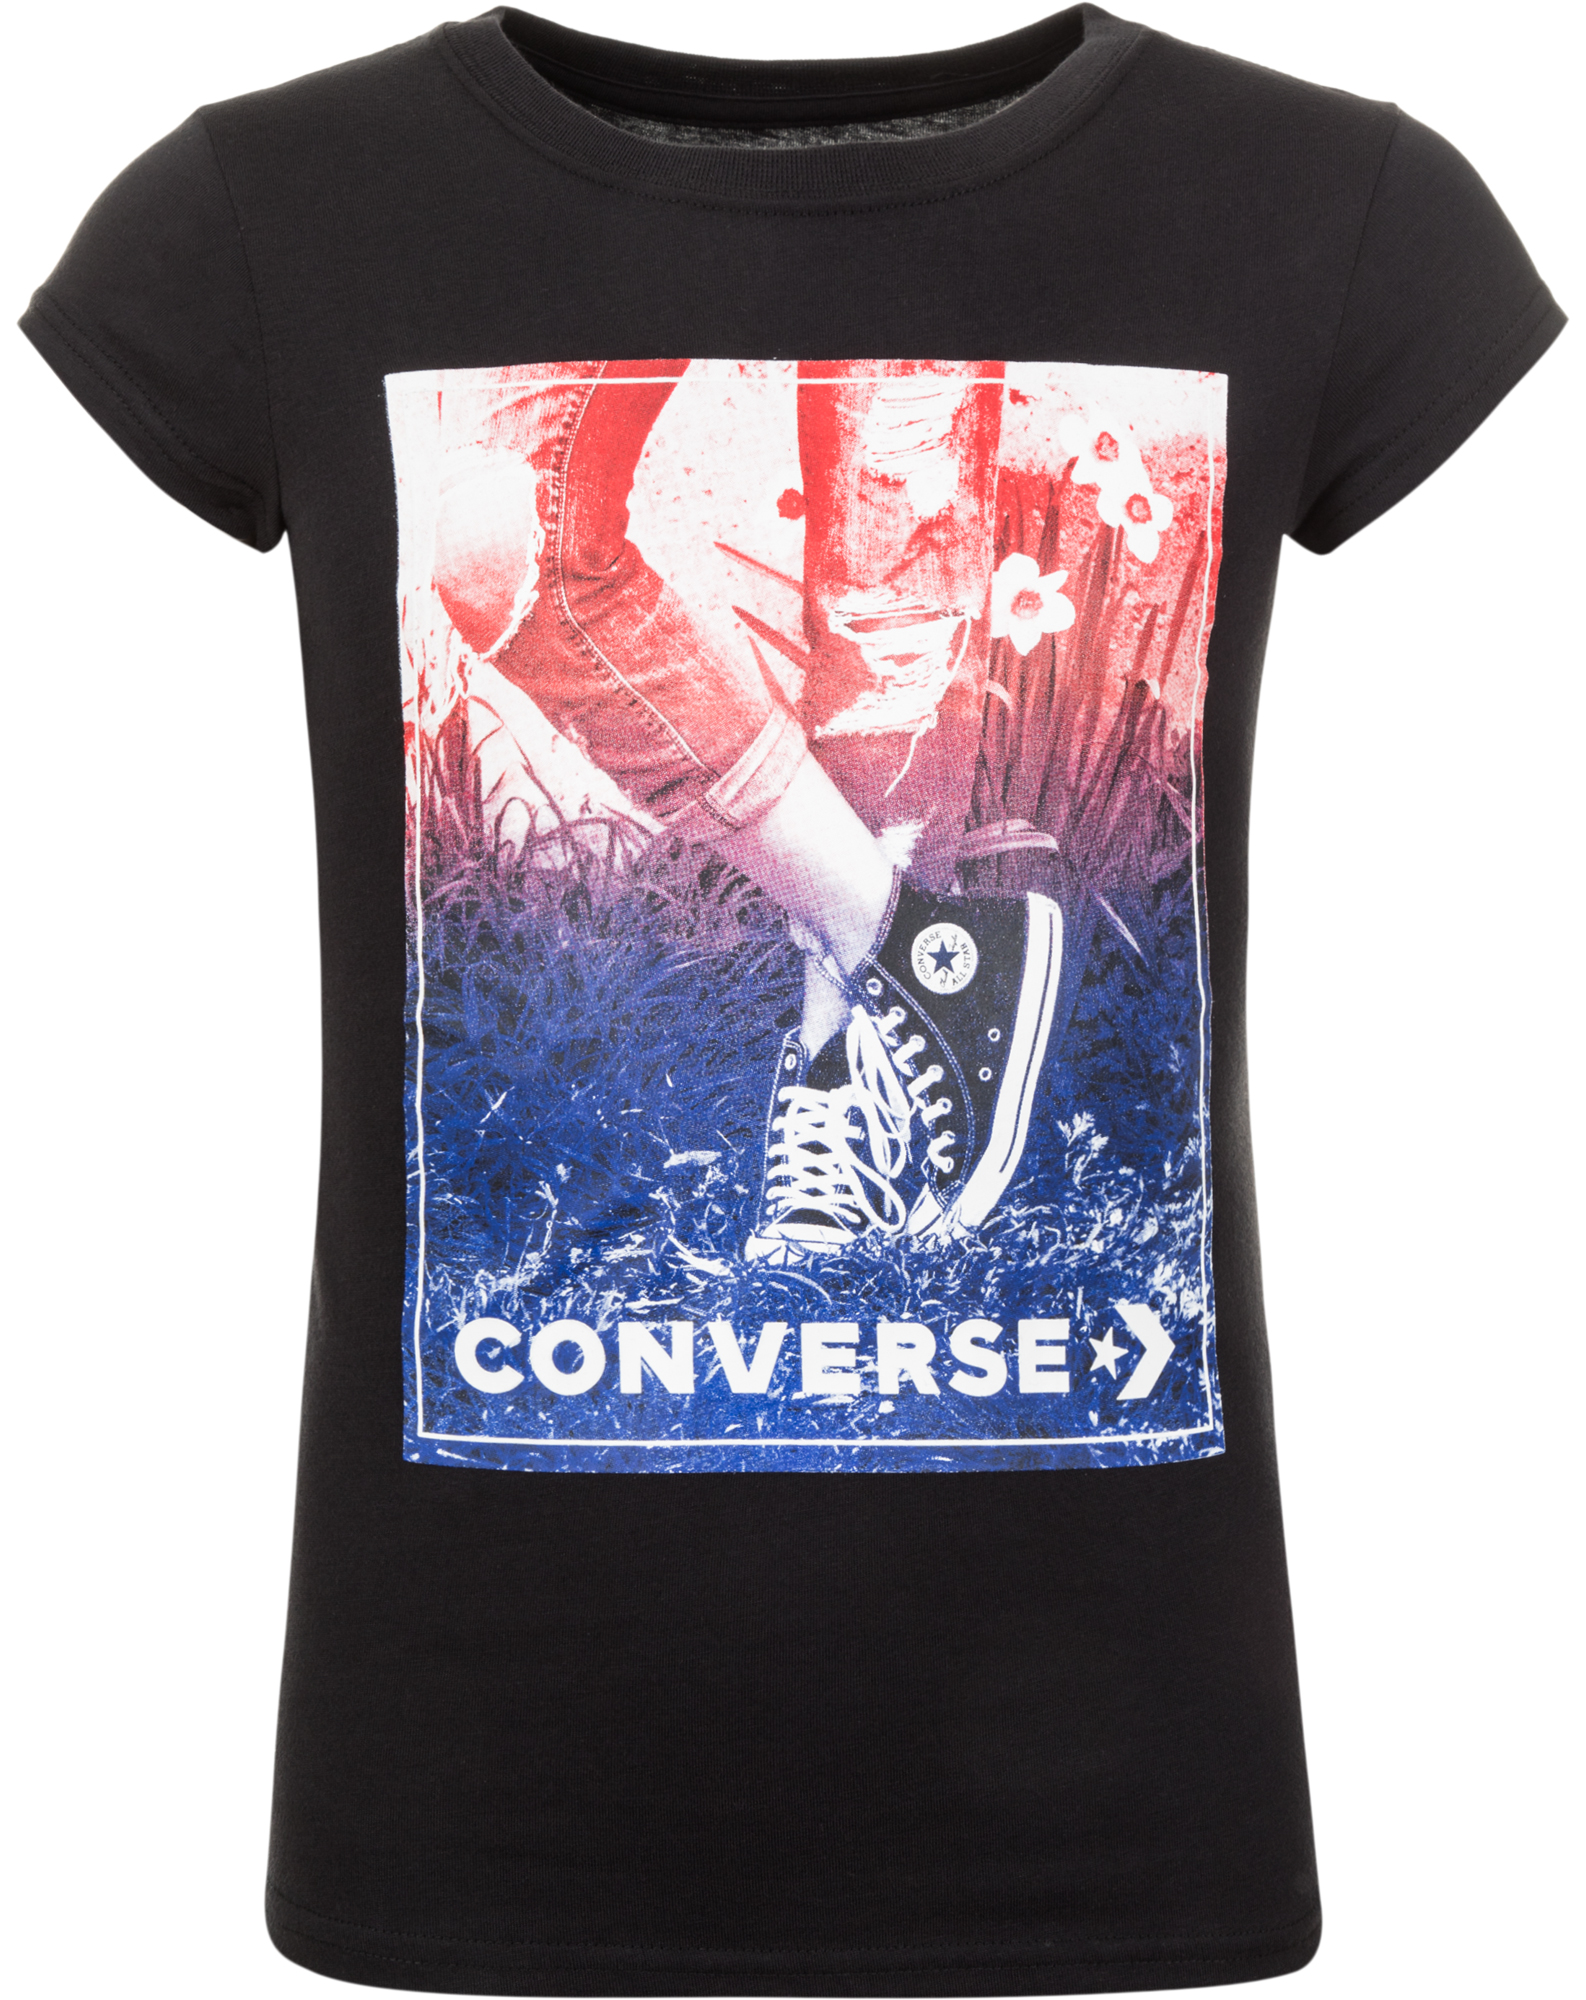 Converse Футболка для девочек Converse, размер 140